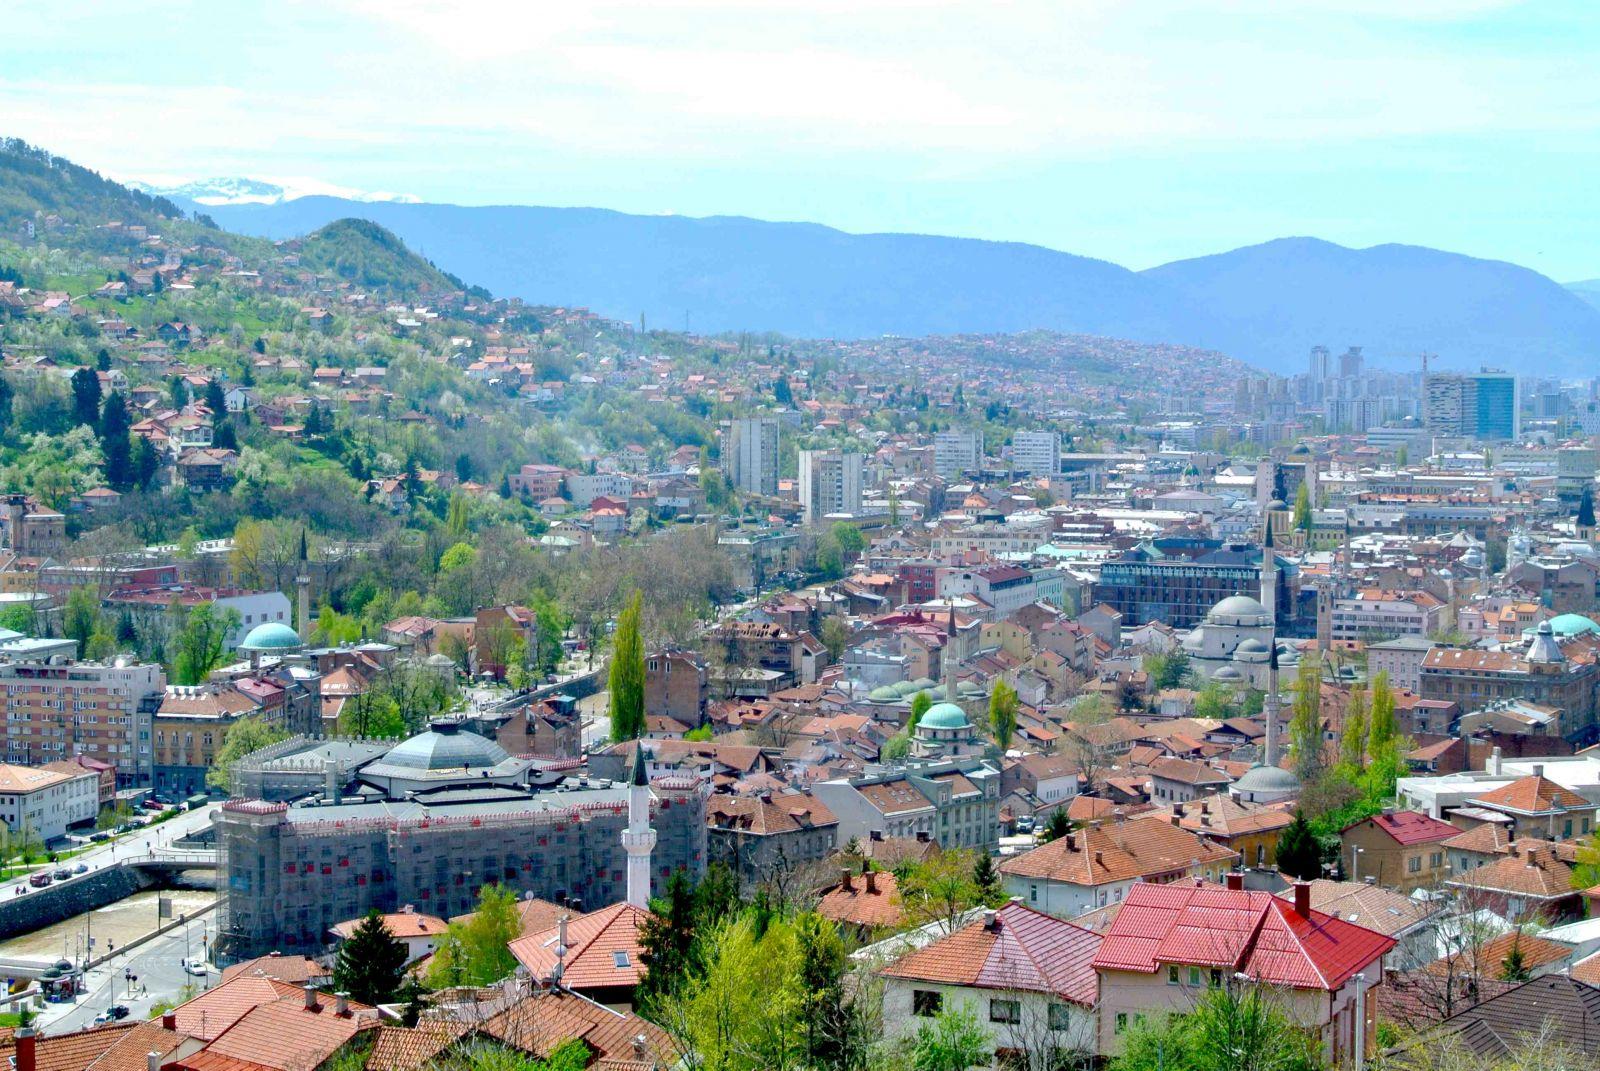 Bosnie-Herzégovine : Court séjour à Sarajevo